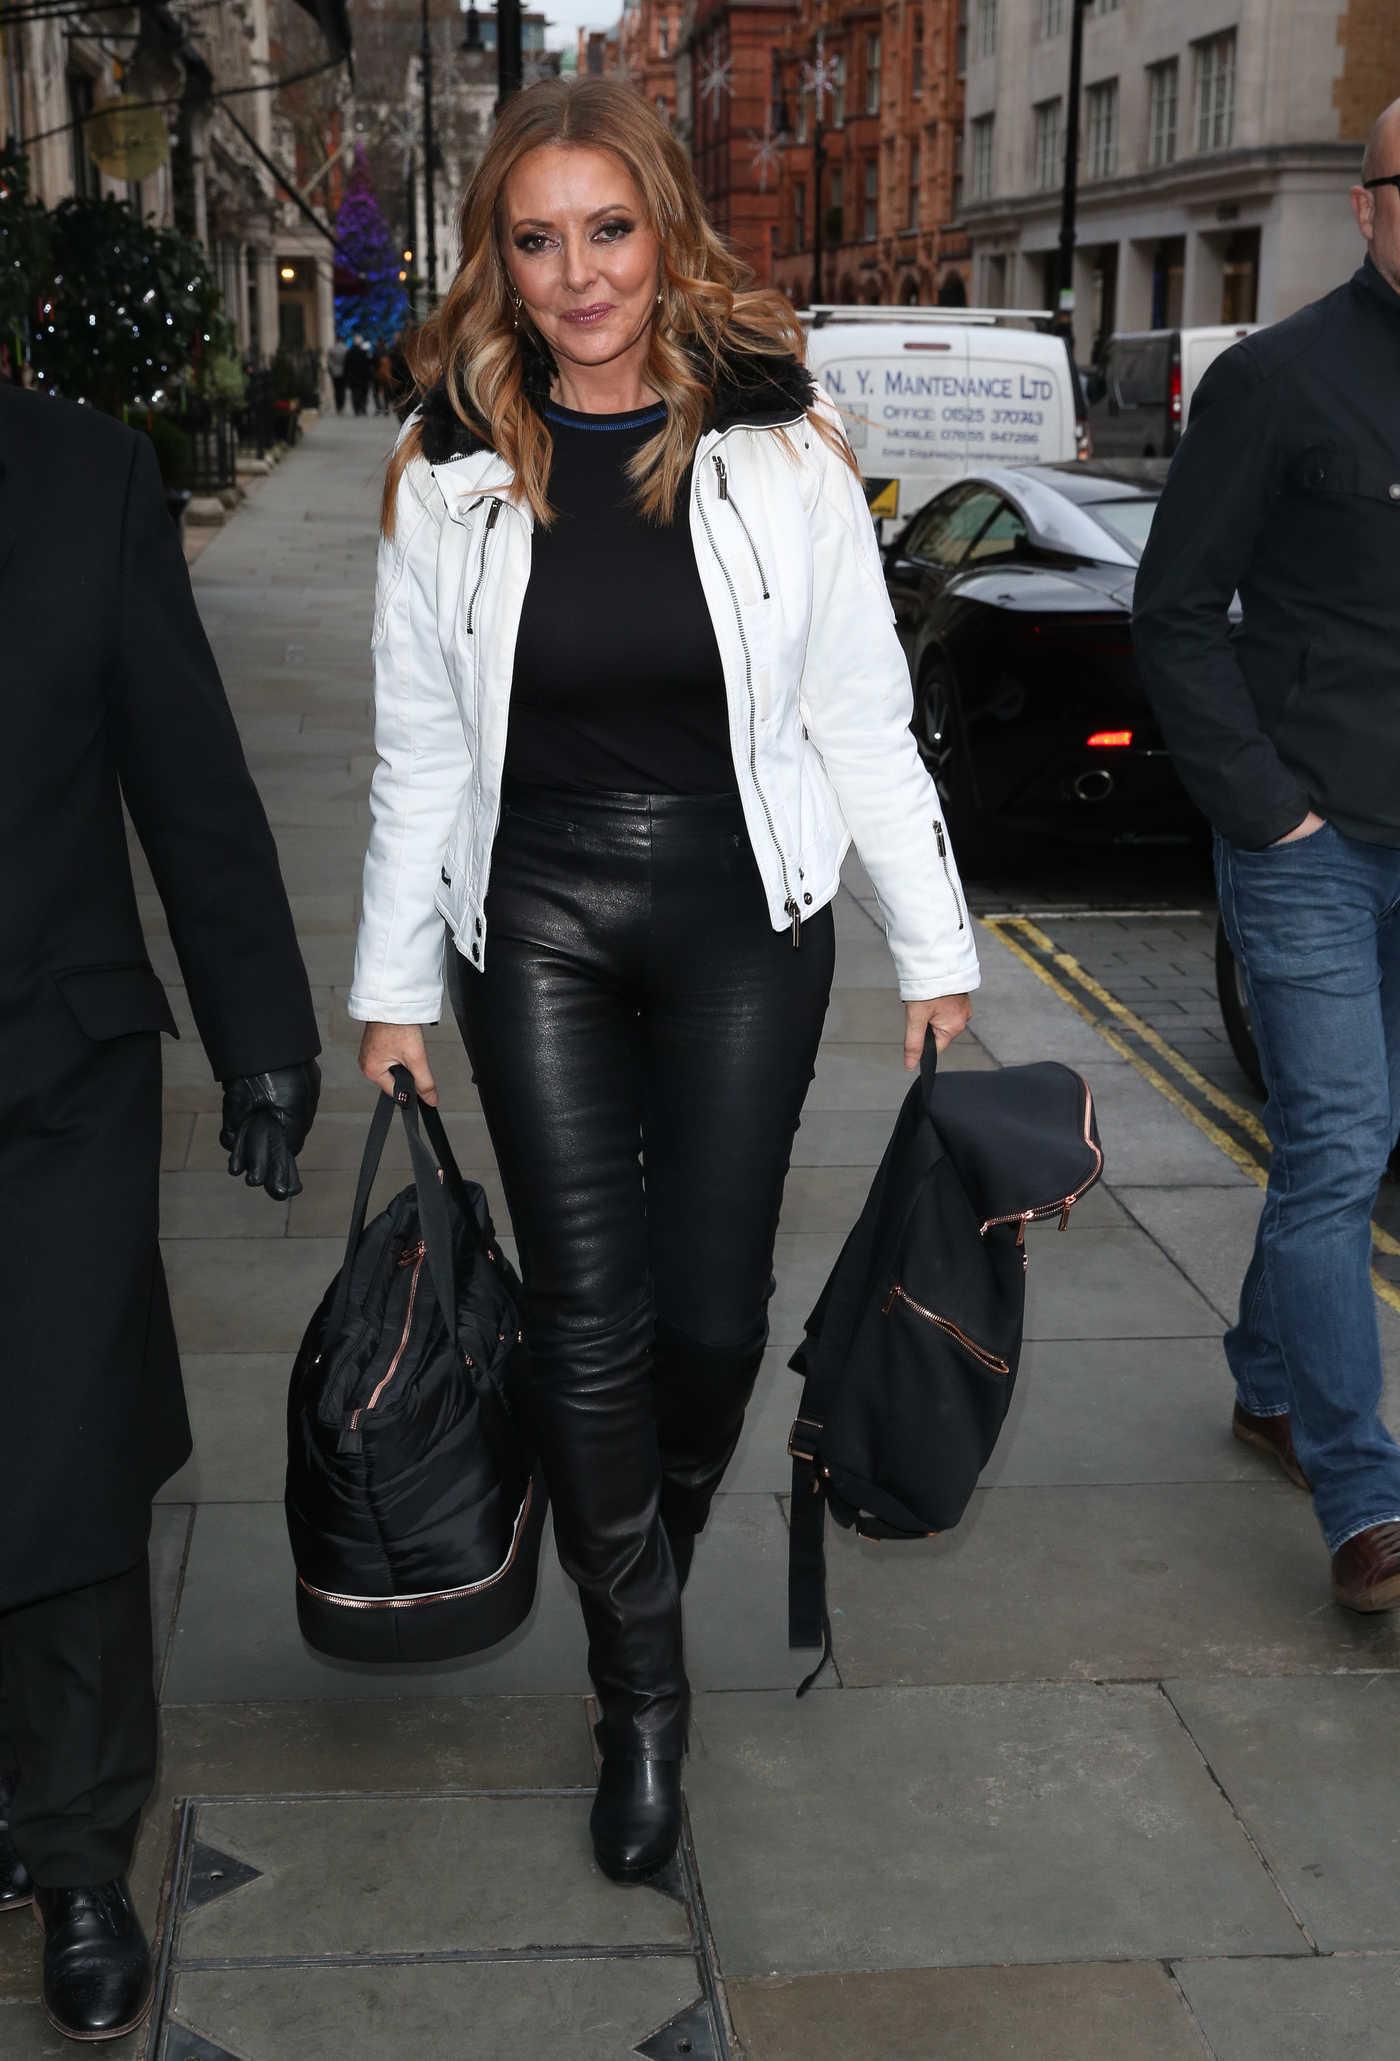 Carol Vorderman in a White Jacket Arrives at Scott's Restaurant in London 12/20/2018